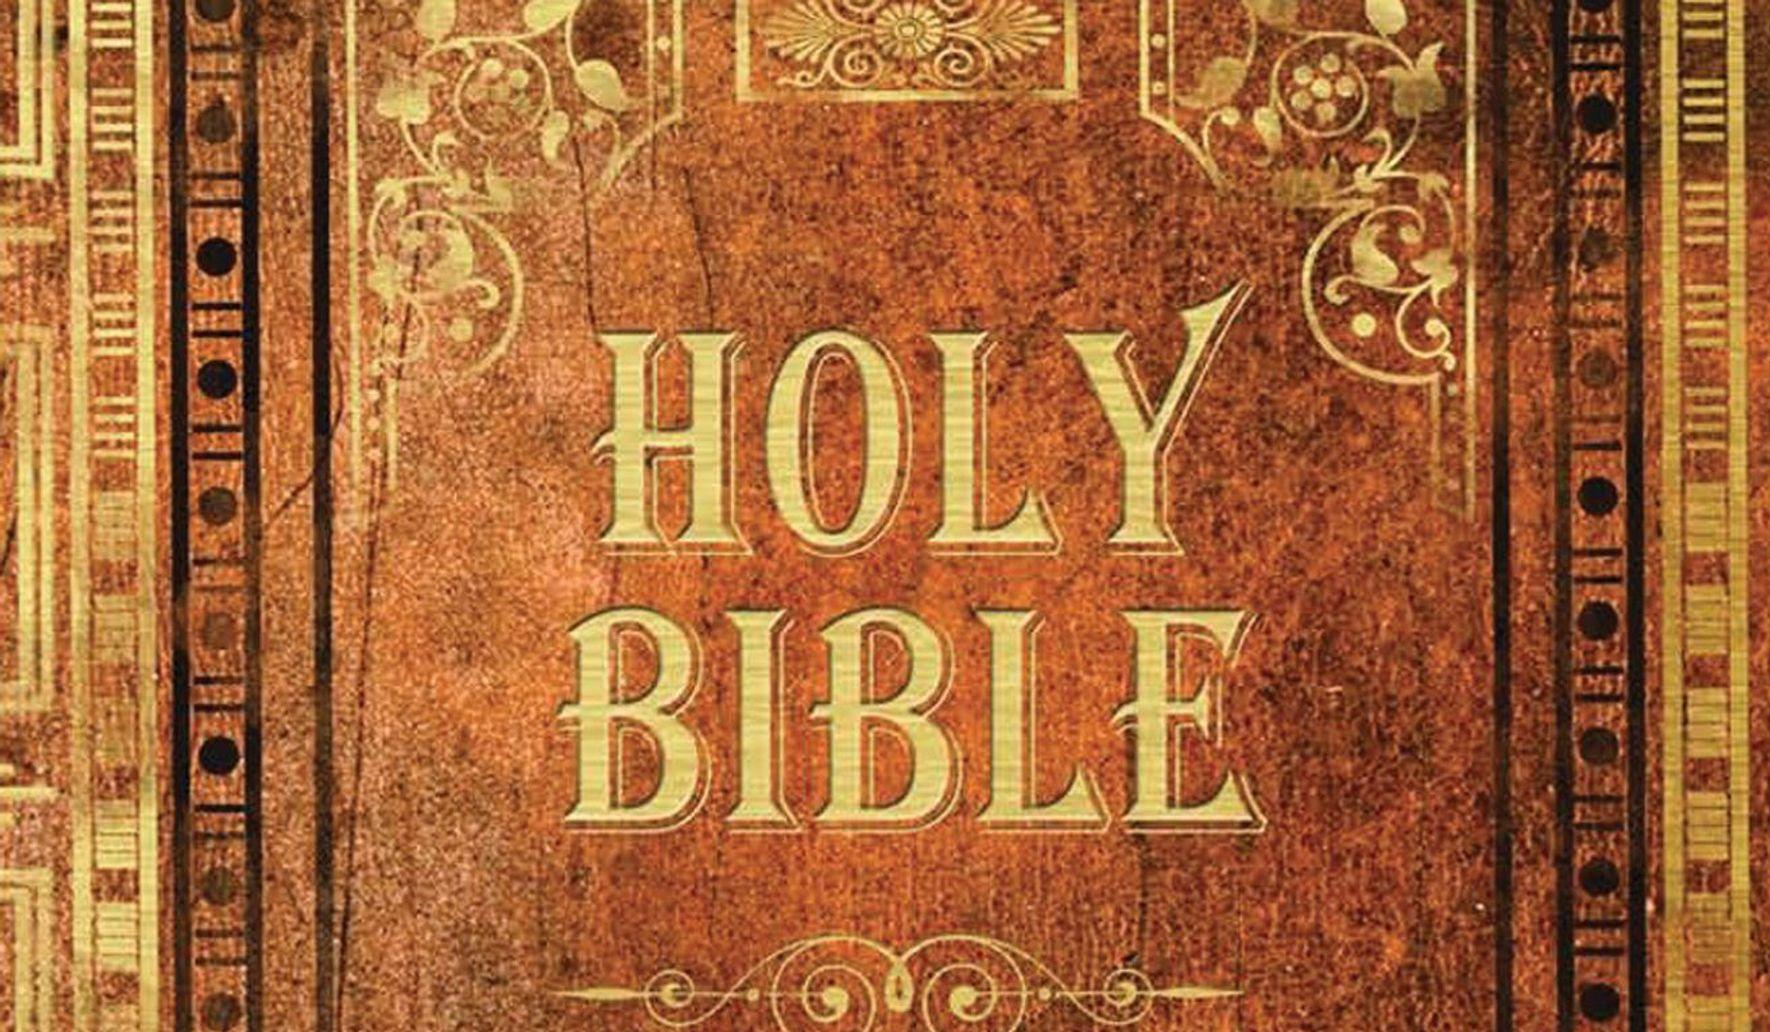 King James Bible's 400-year reign - Washington Times